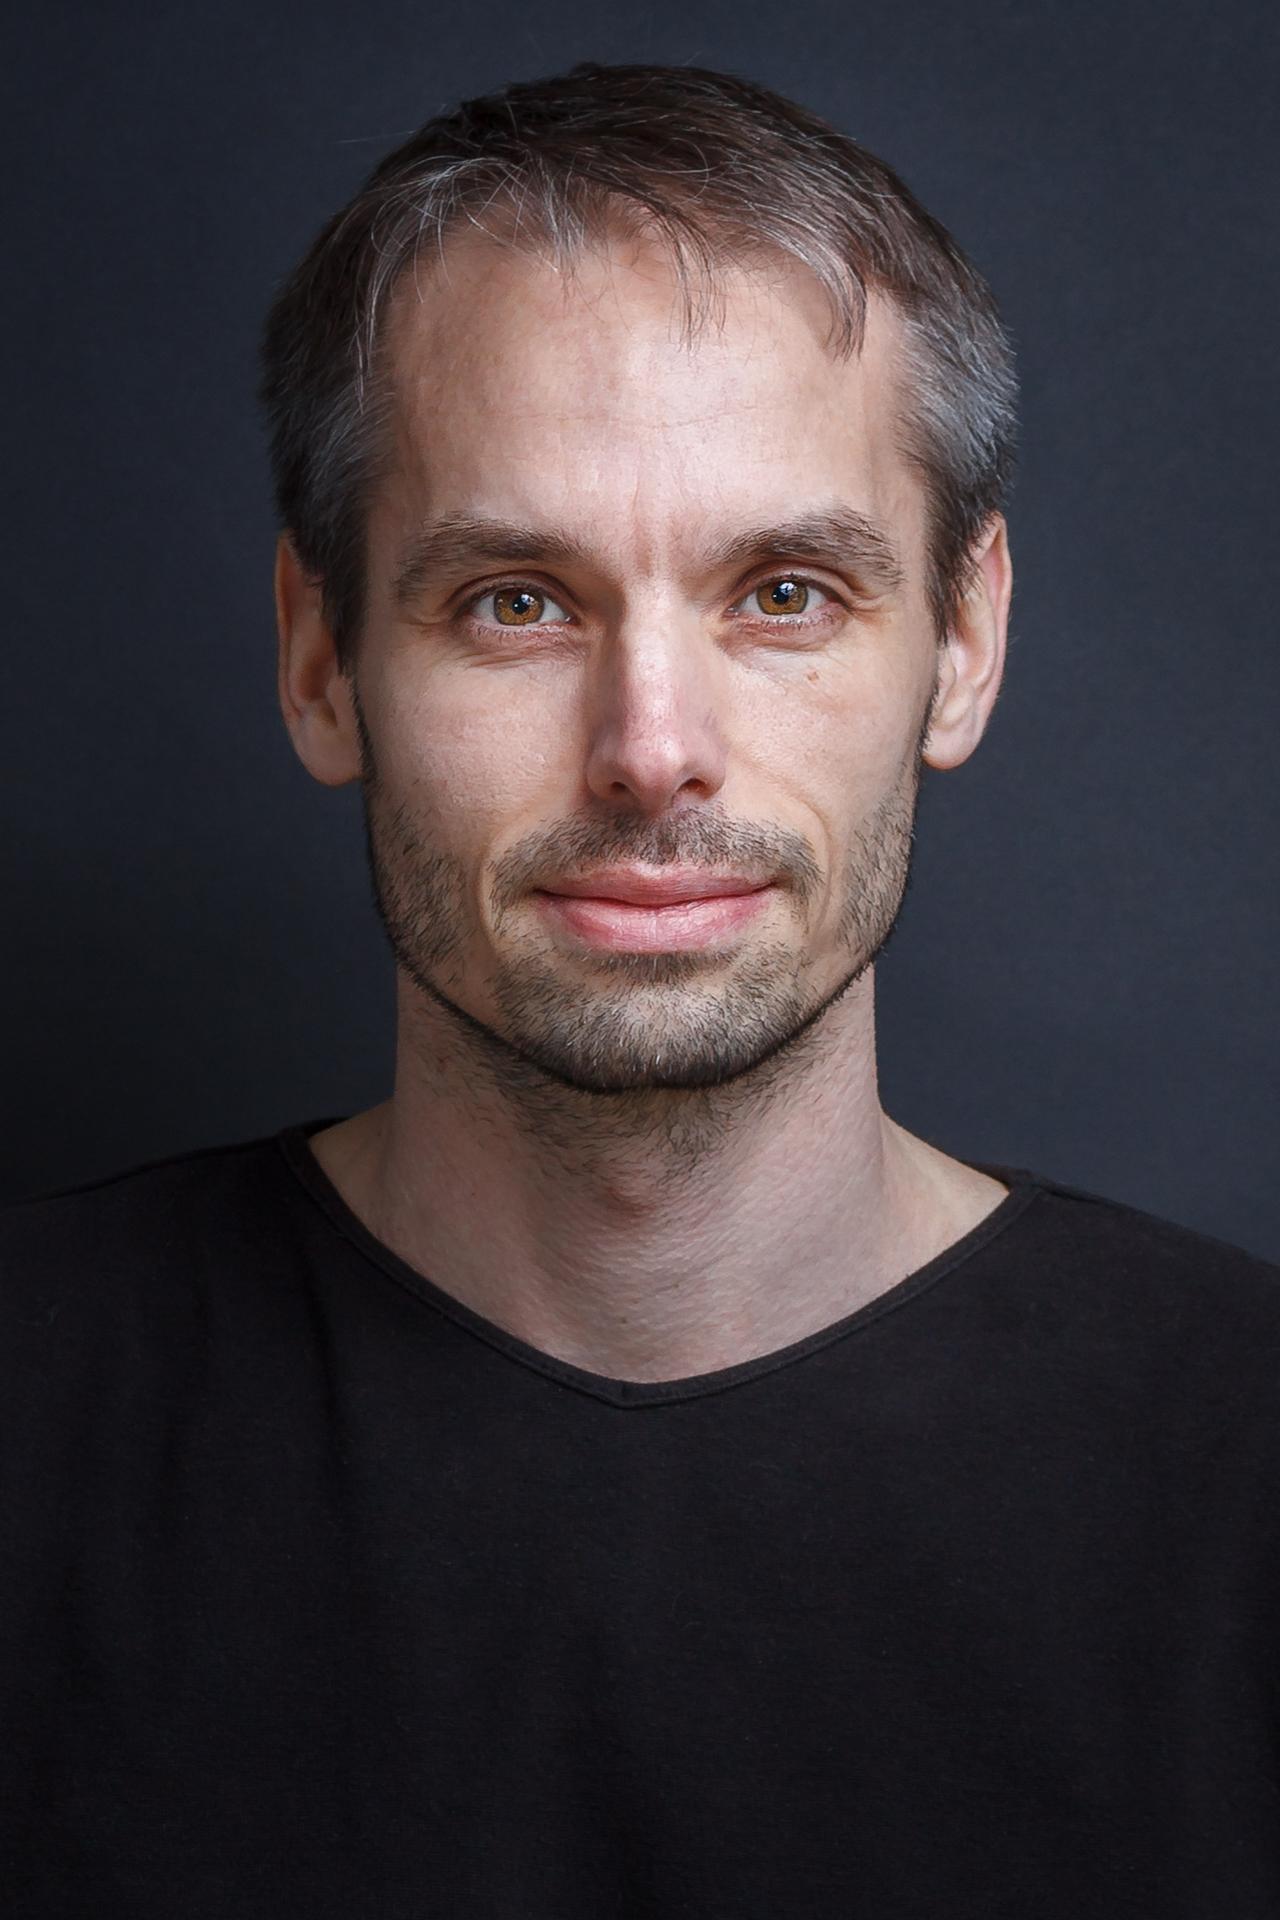 Martin Wilczek